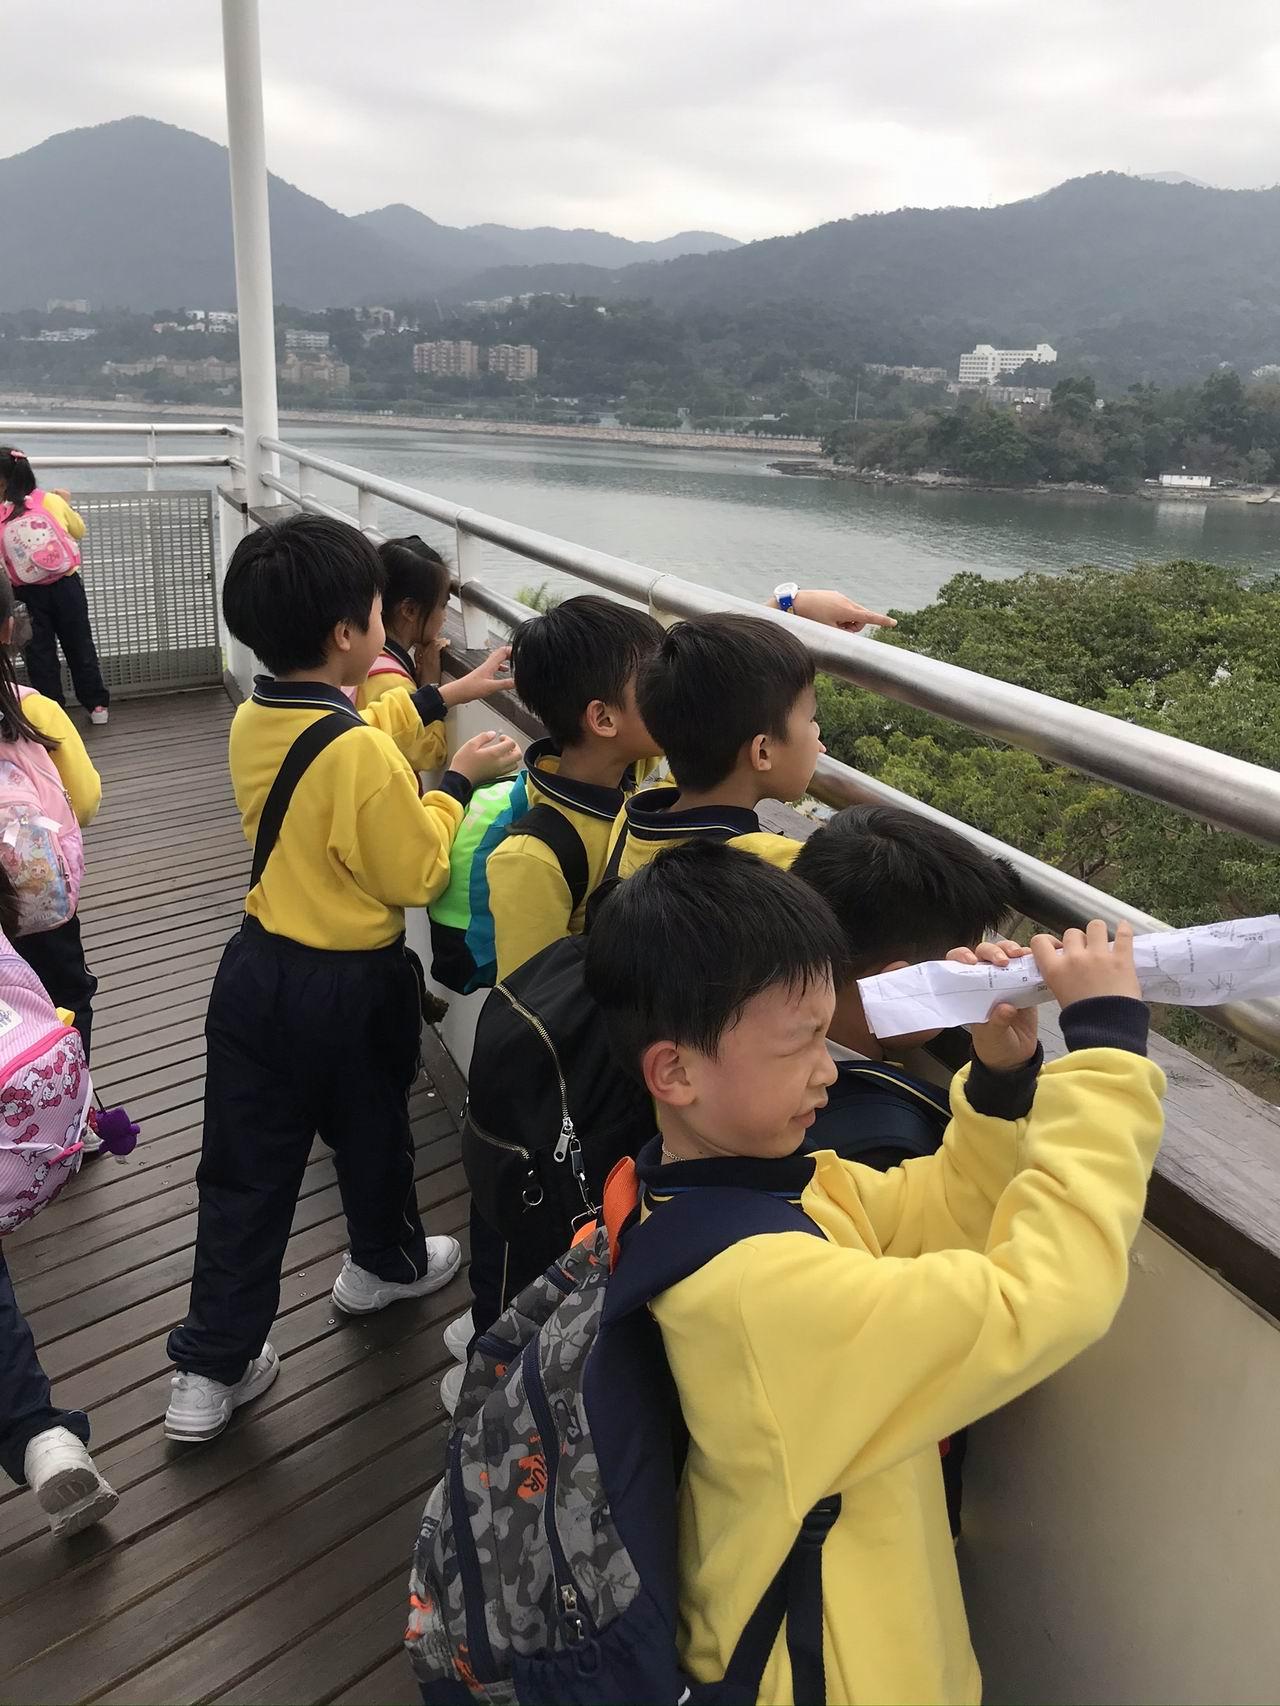 https://plkcjy.edu.hk/sites/default/files/img_7654.jpeg